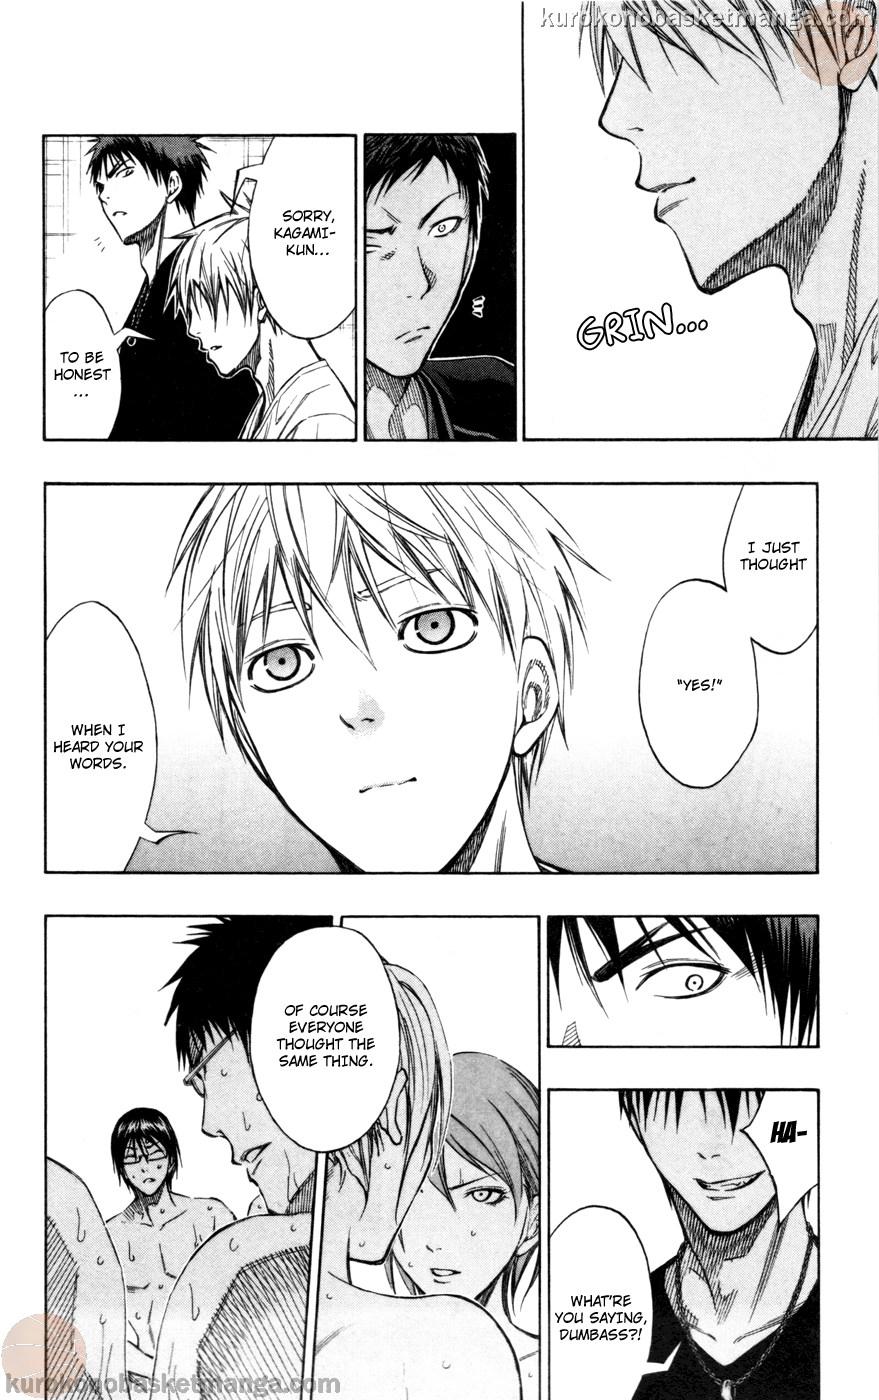 Kuroko no Basket Manga Chapter 110 - Image 18